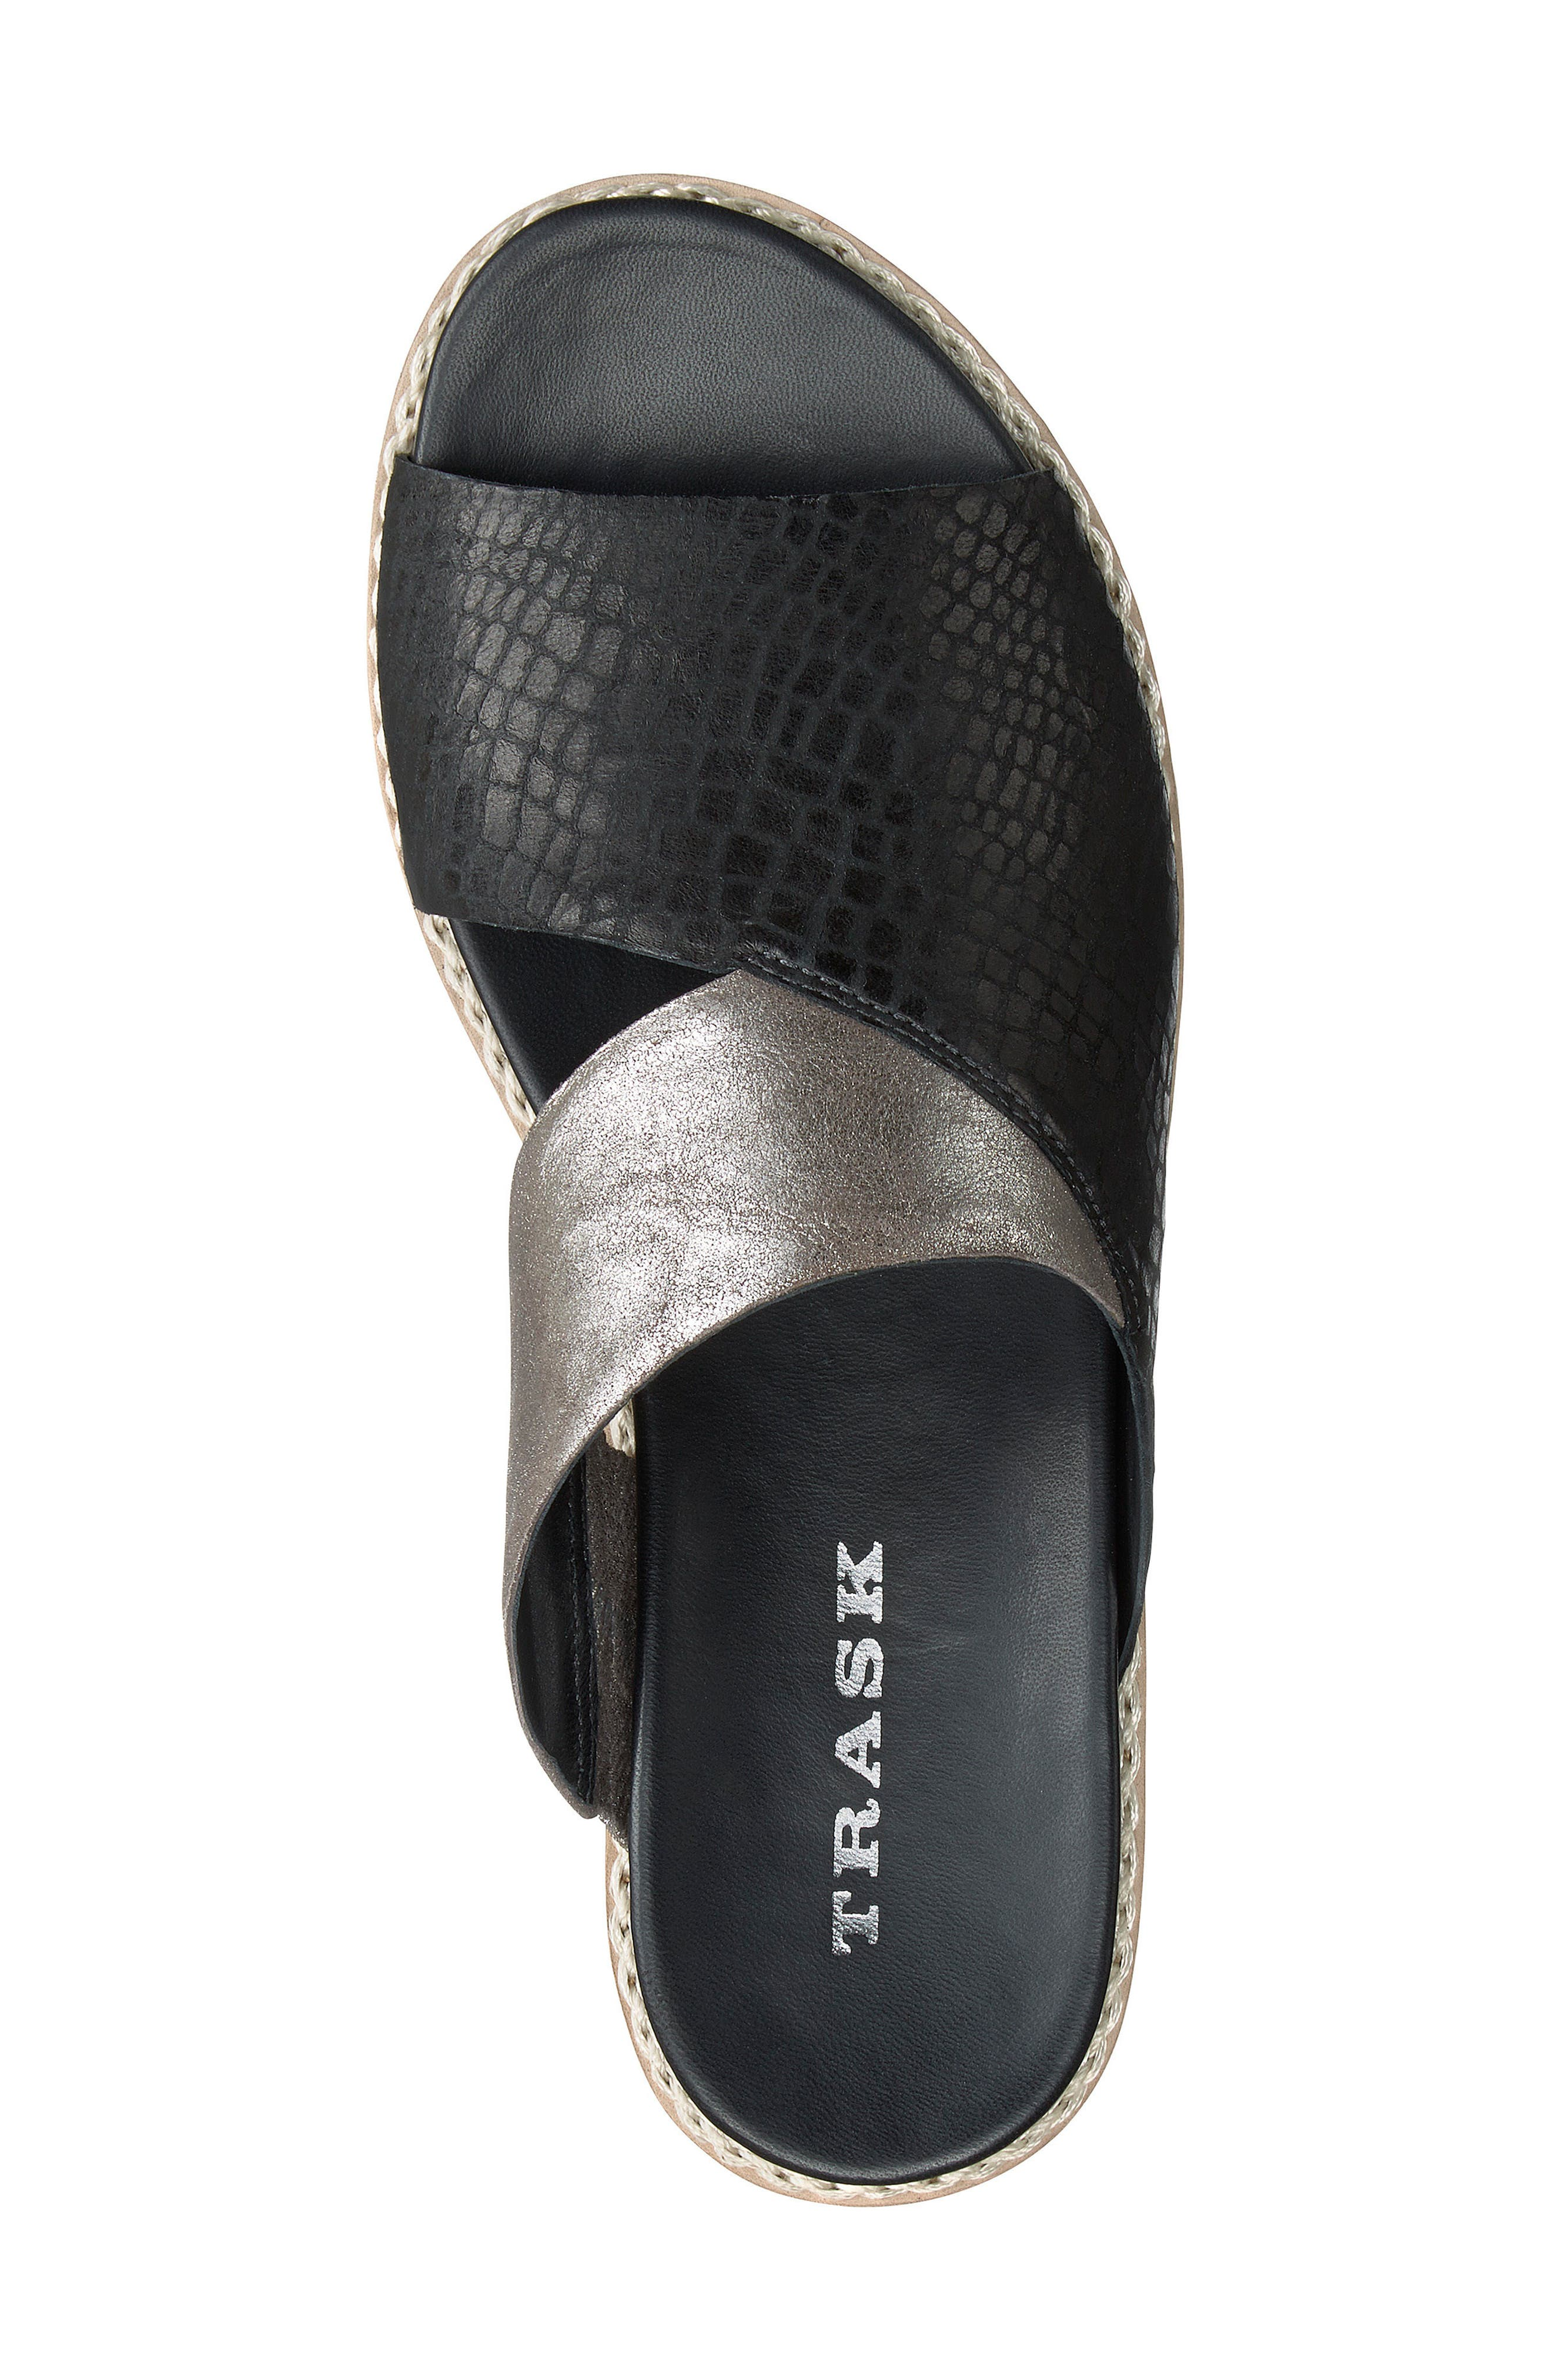 Codi Sandal,                             Alternate thumbnail 5, color,                             Black Embossed Leather